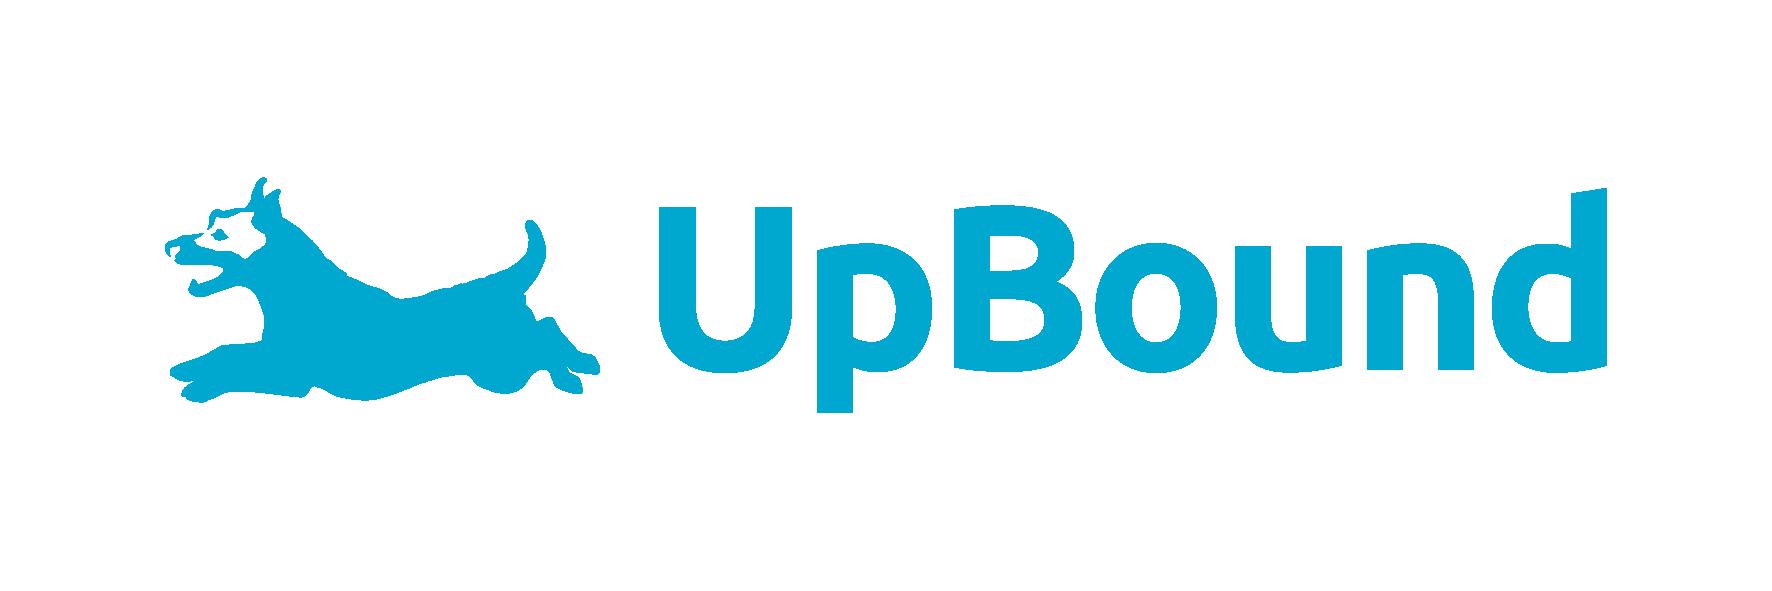 UpBound Small Business Marketing & Digital Marketing